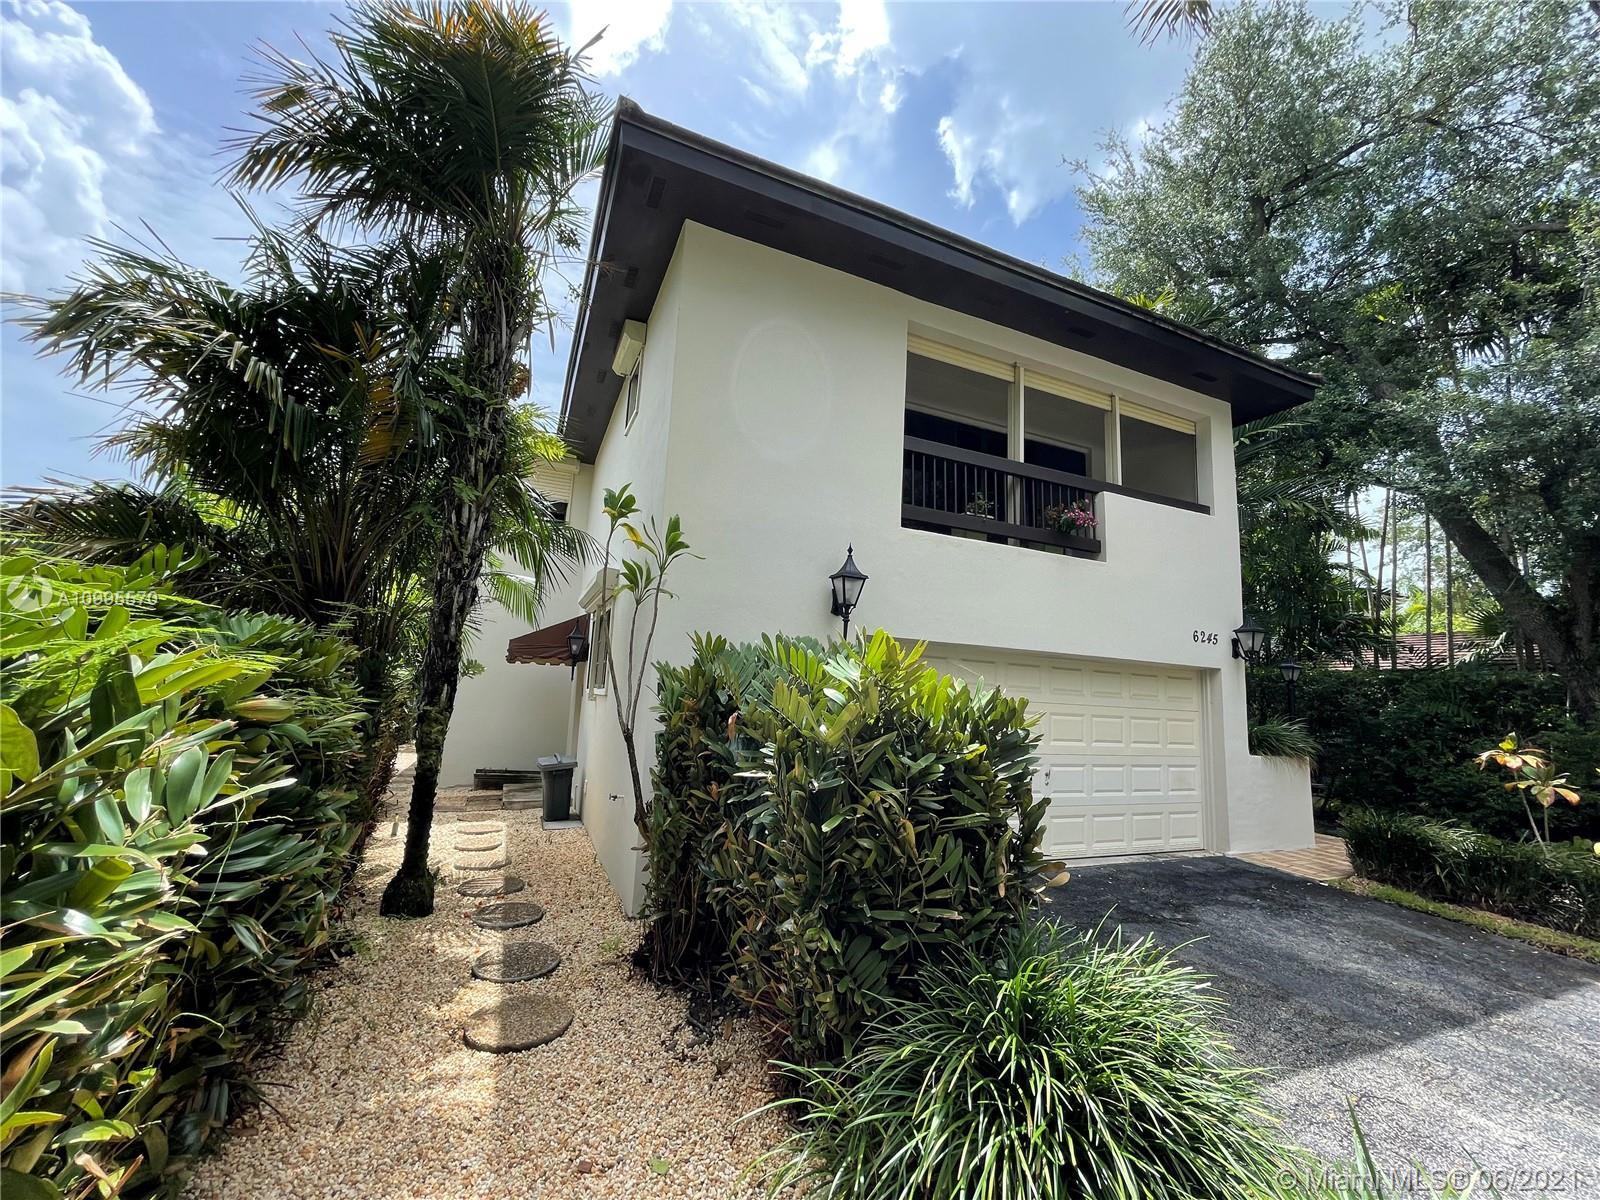 Riviera - 6245 Maynada St, Coral Gables, FL 33146